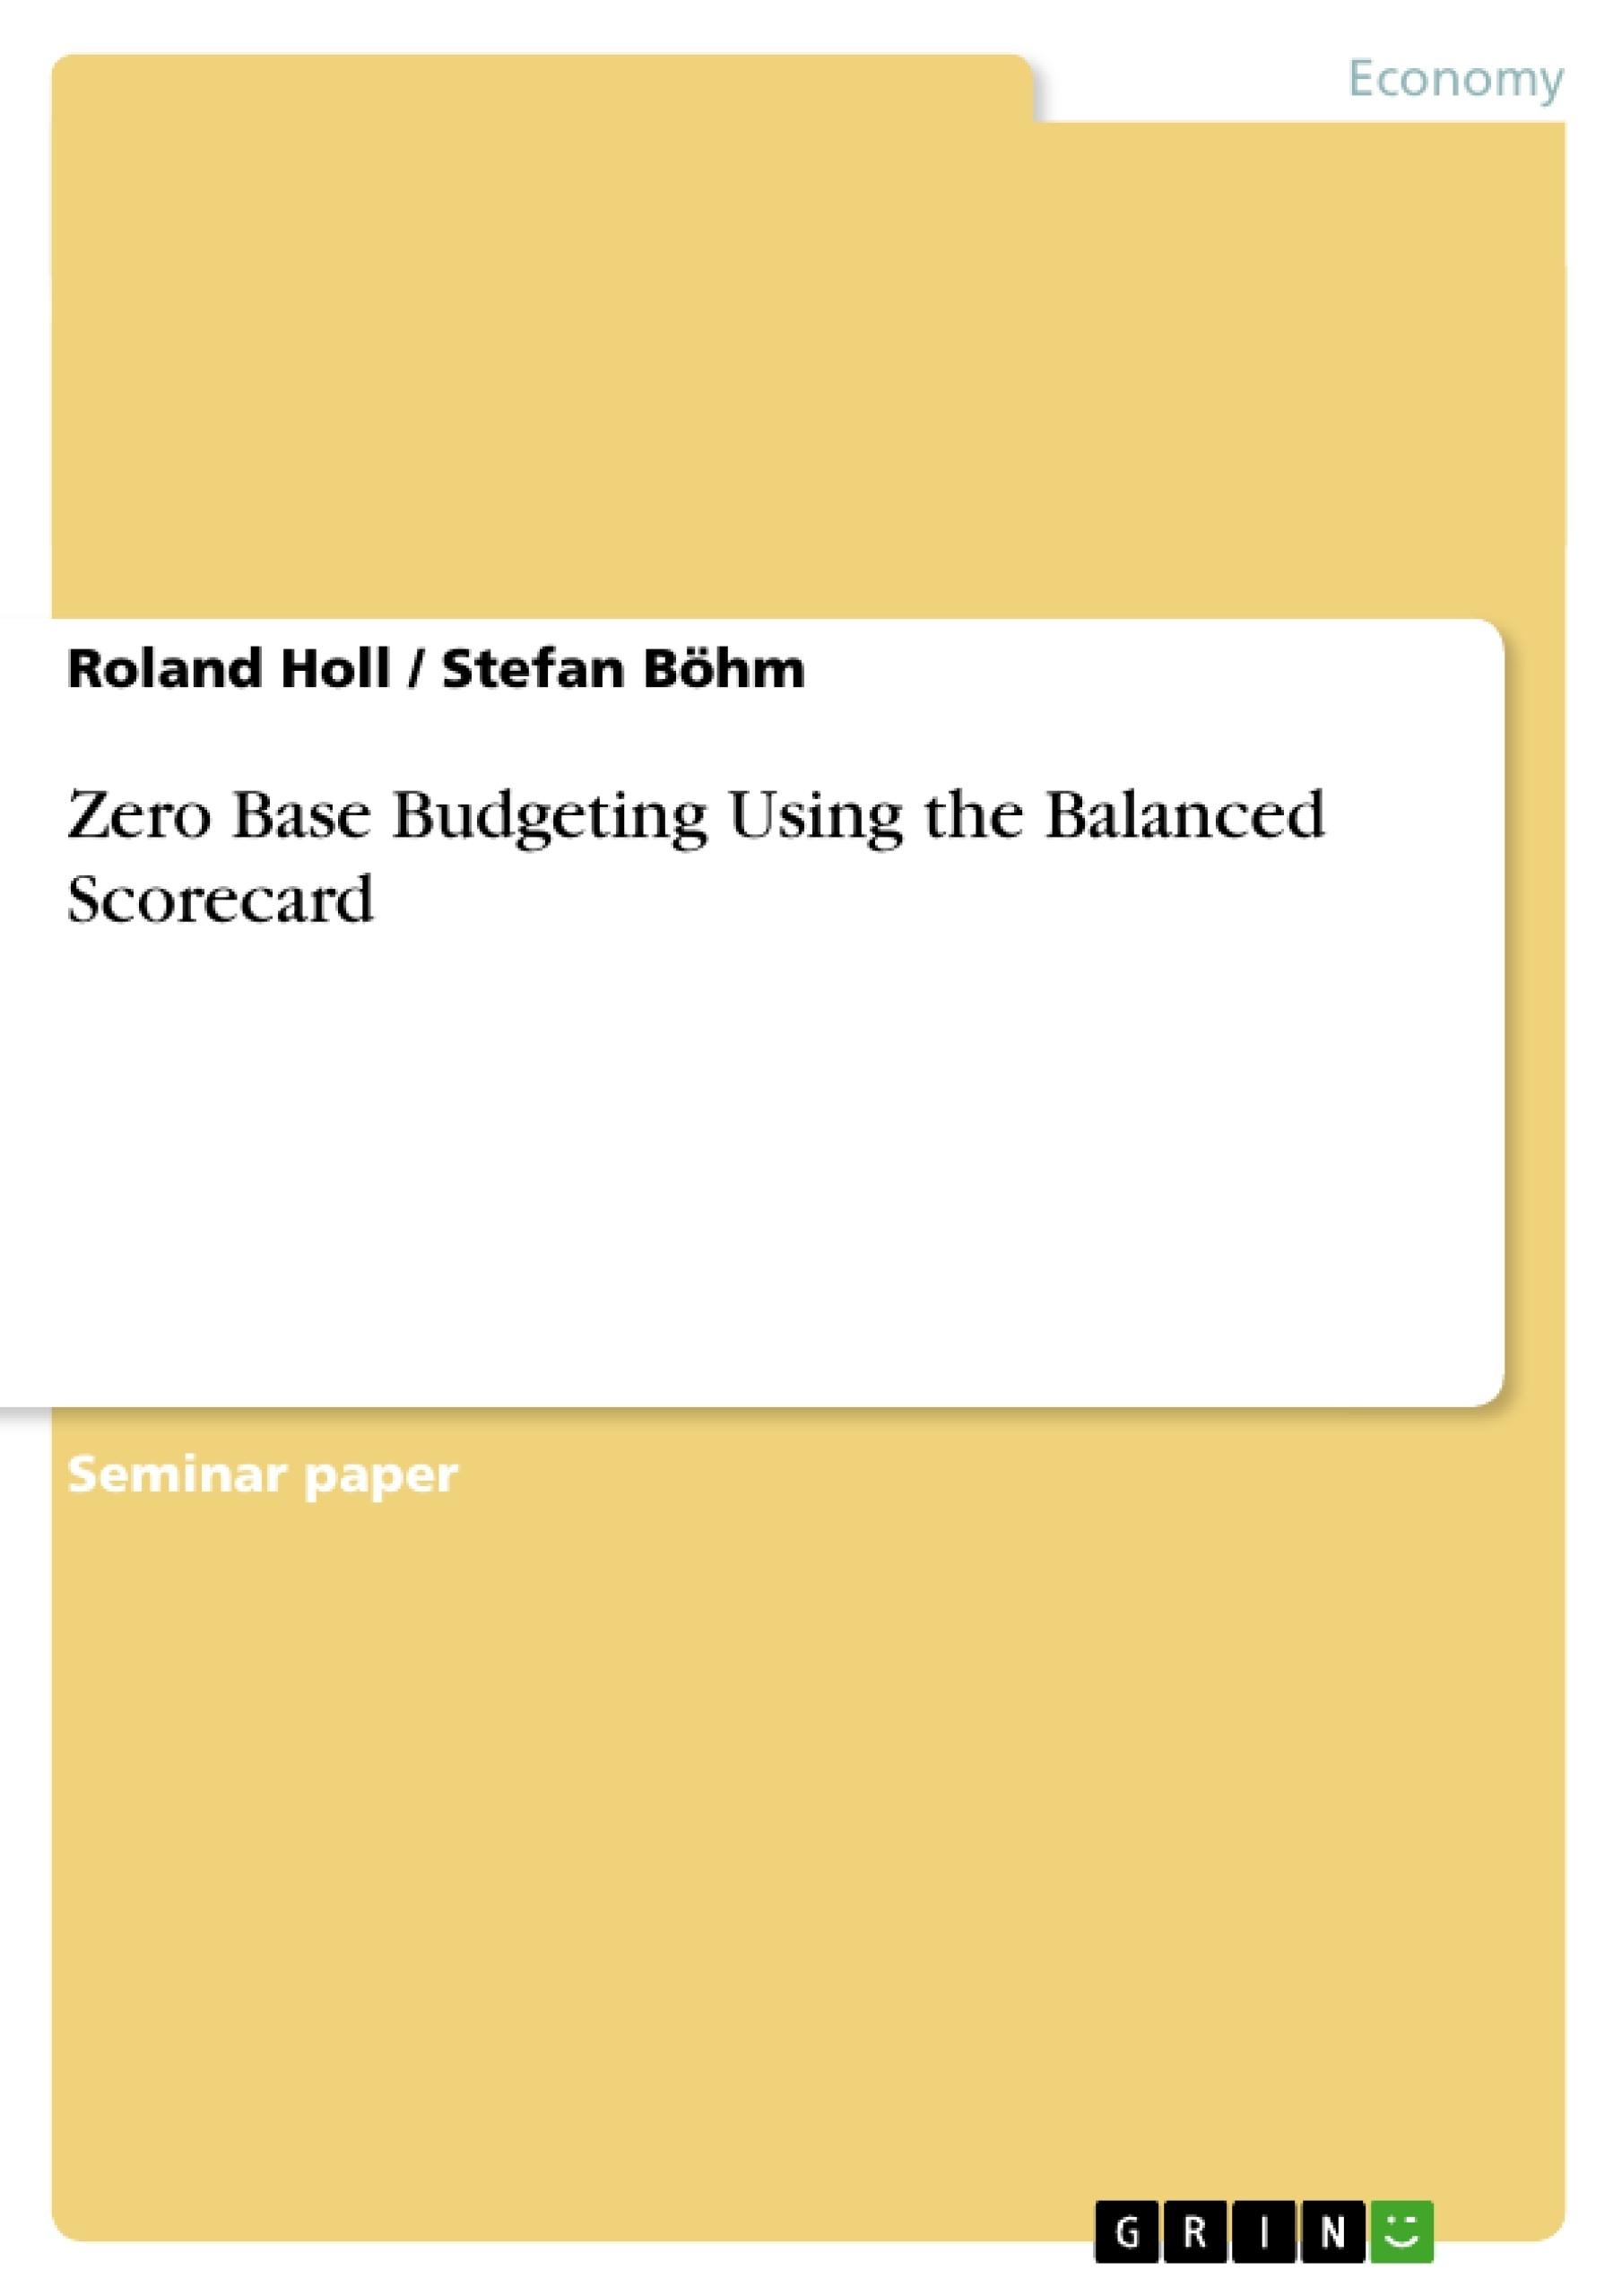 Bachelor thesis balanced scorecard